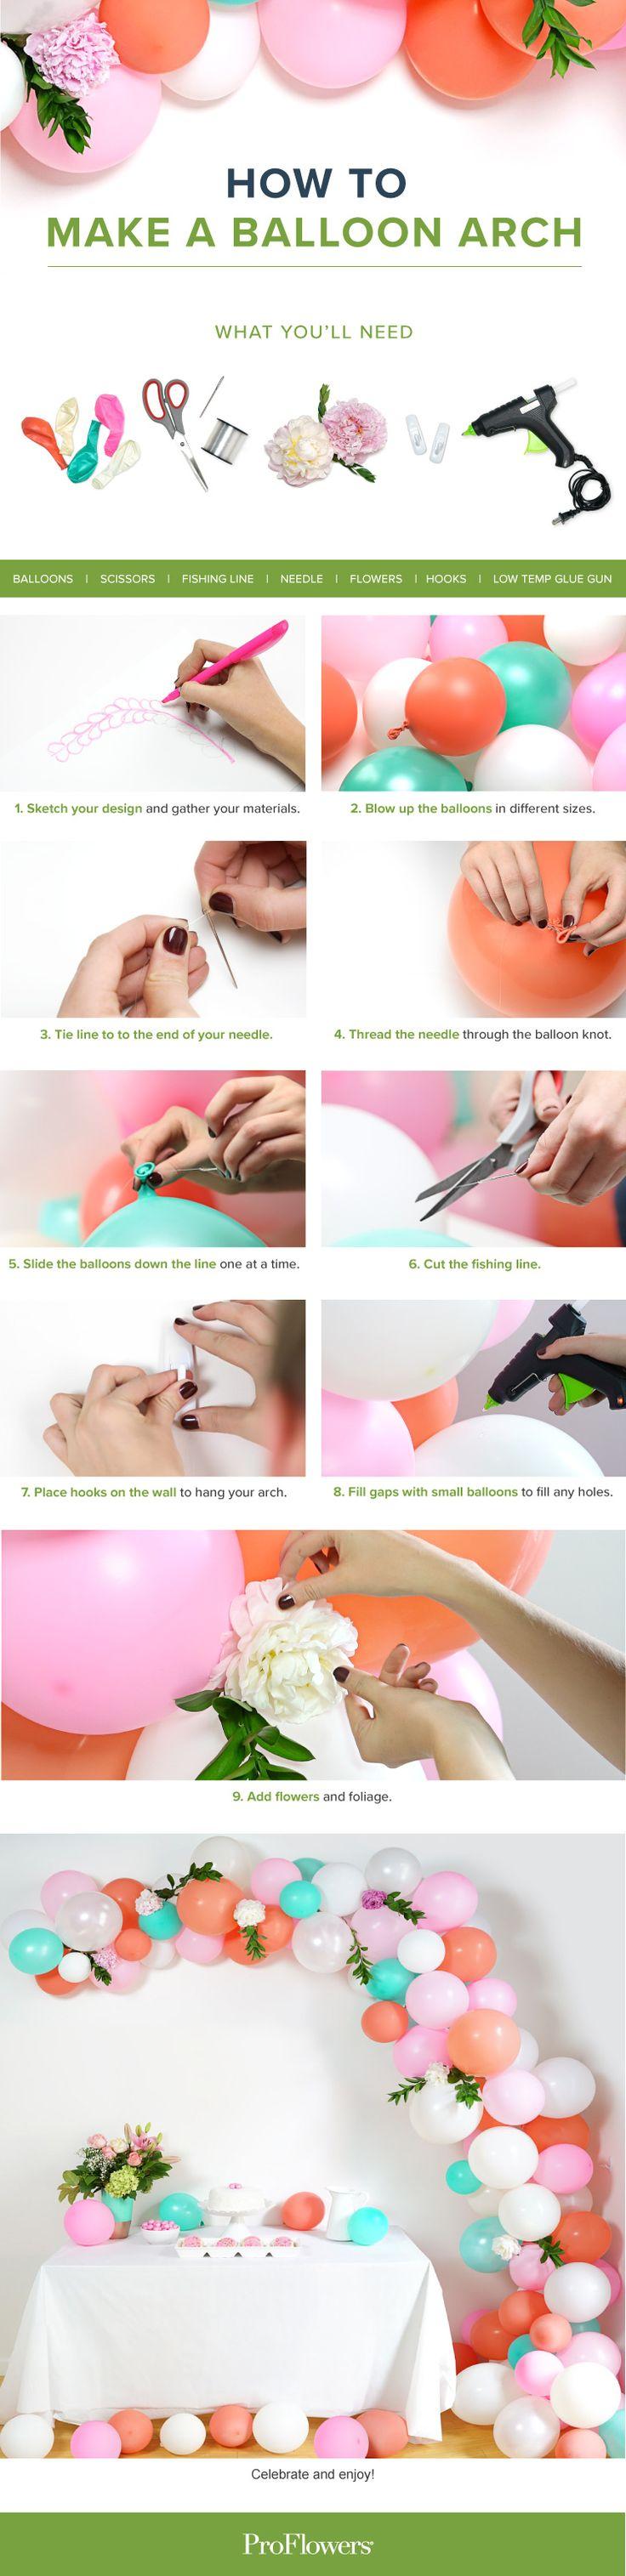 DIY Balloon Arch - it's so easy!